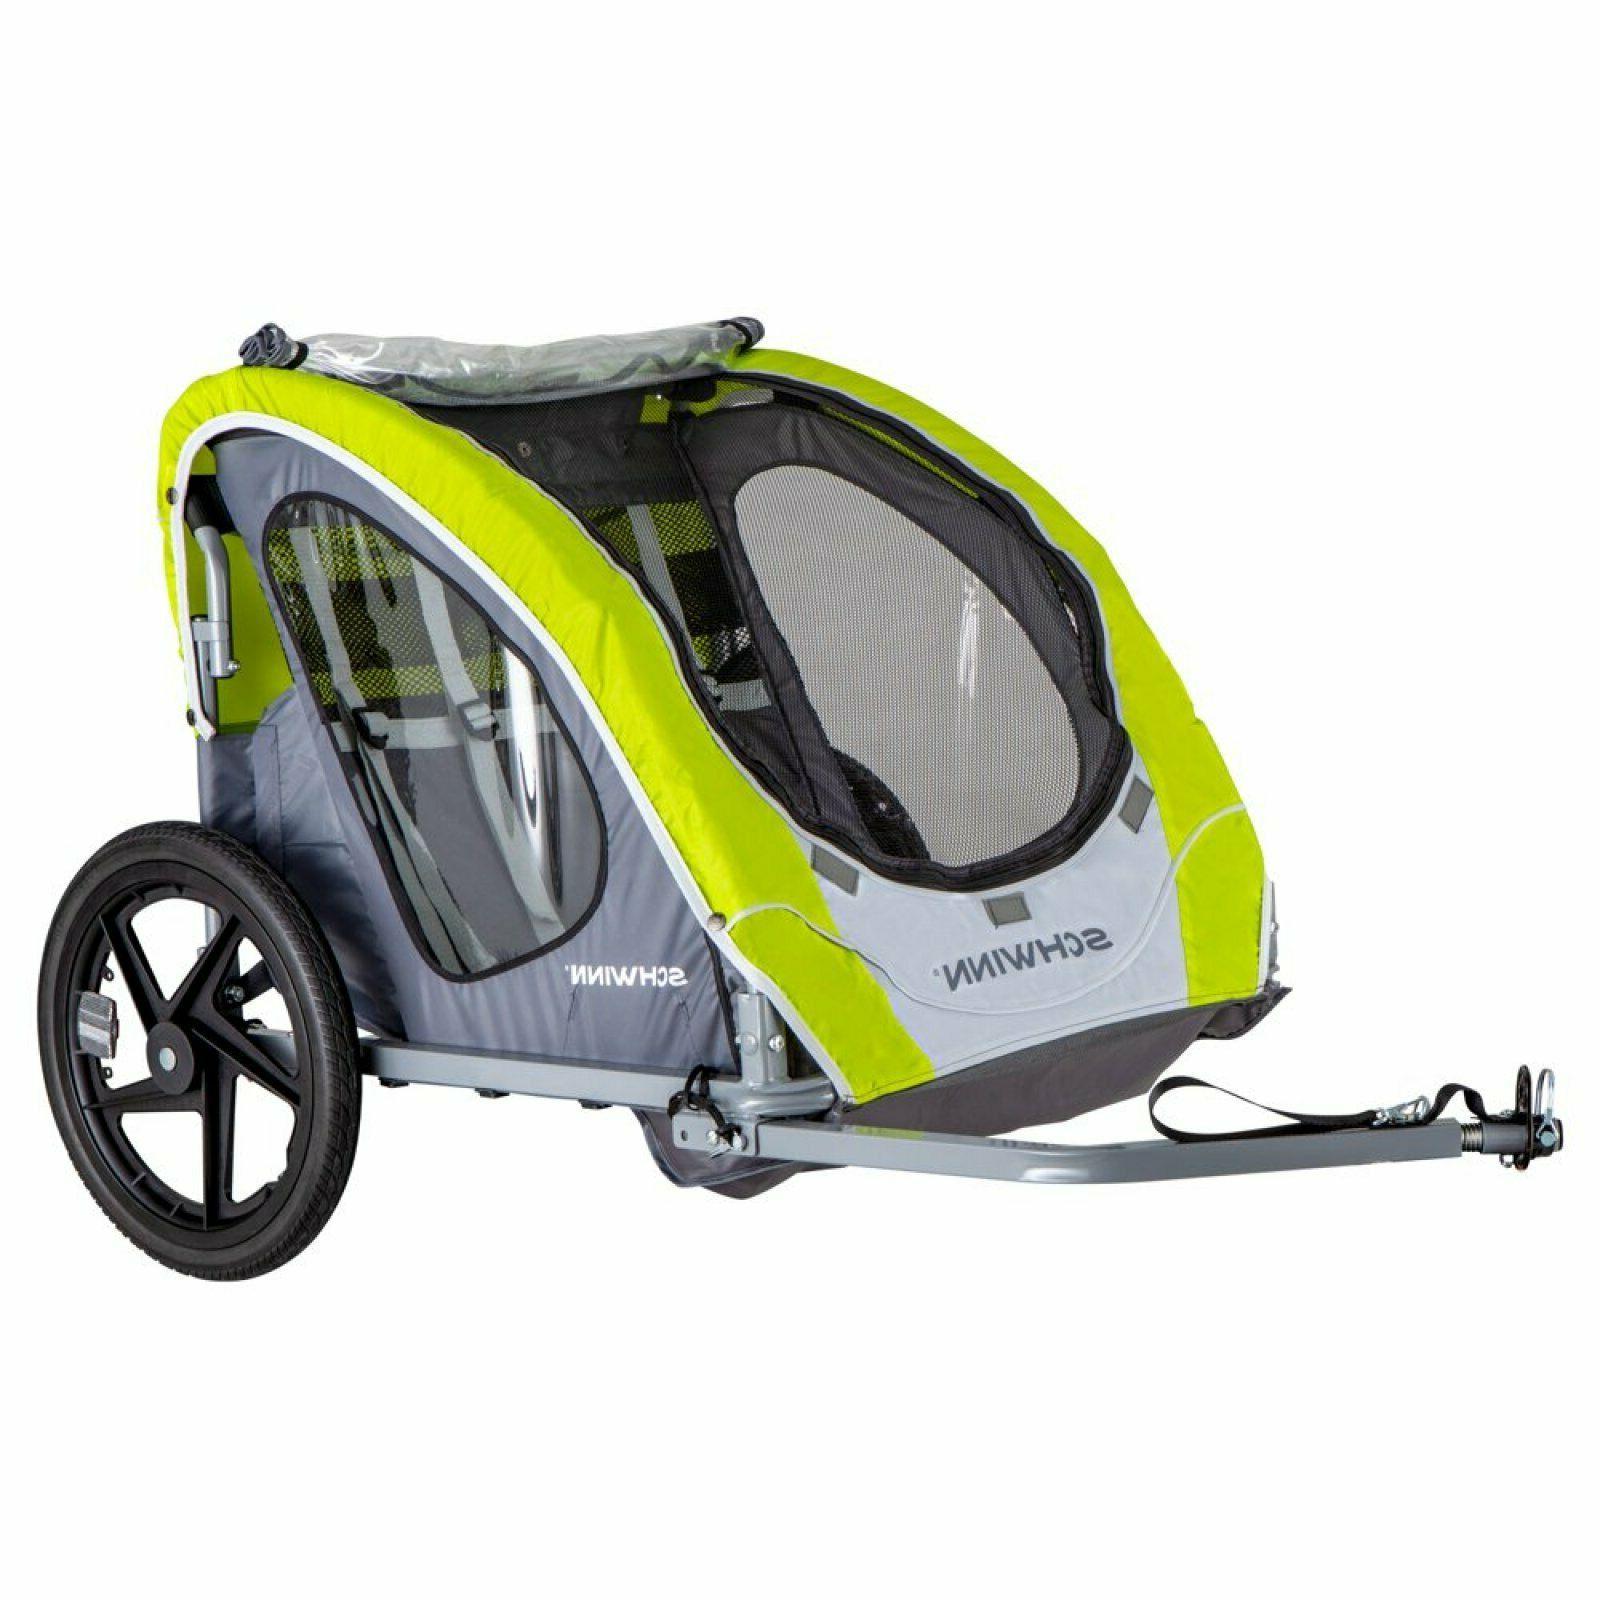 Schwinn Shuttle Kids Fun Safe Foldable Bike Outdoor Green Tr